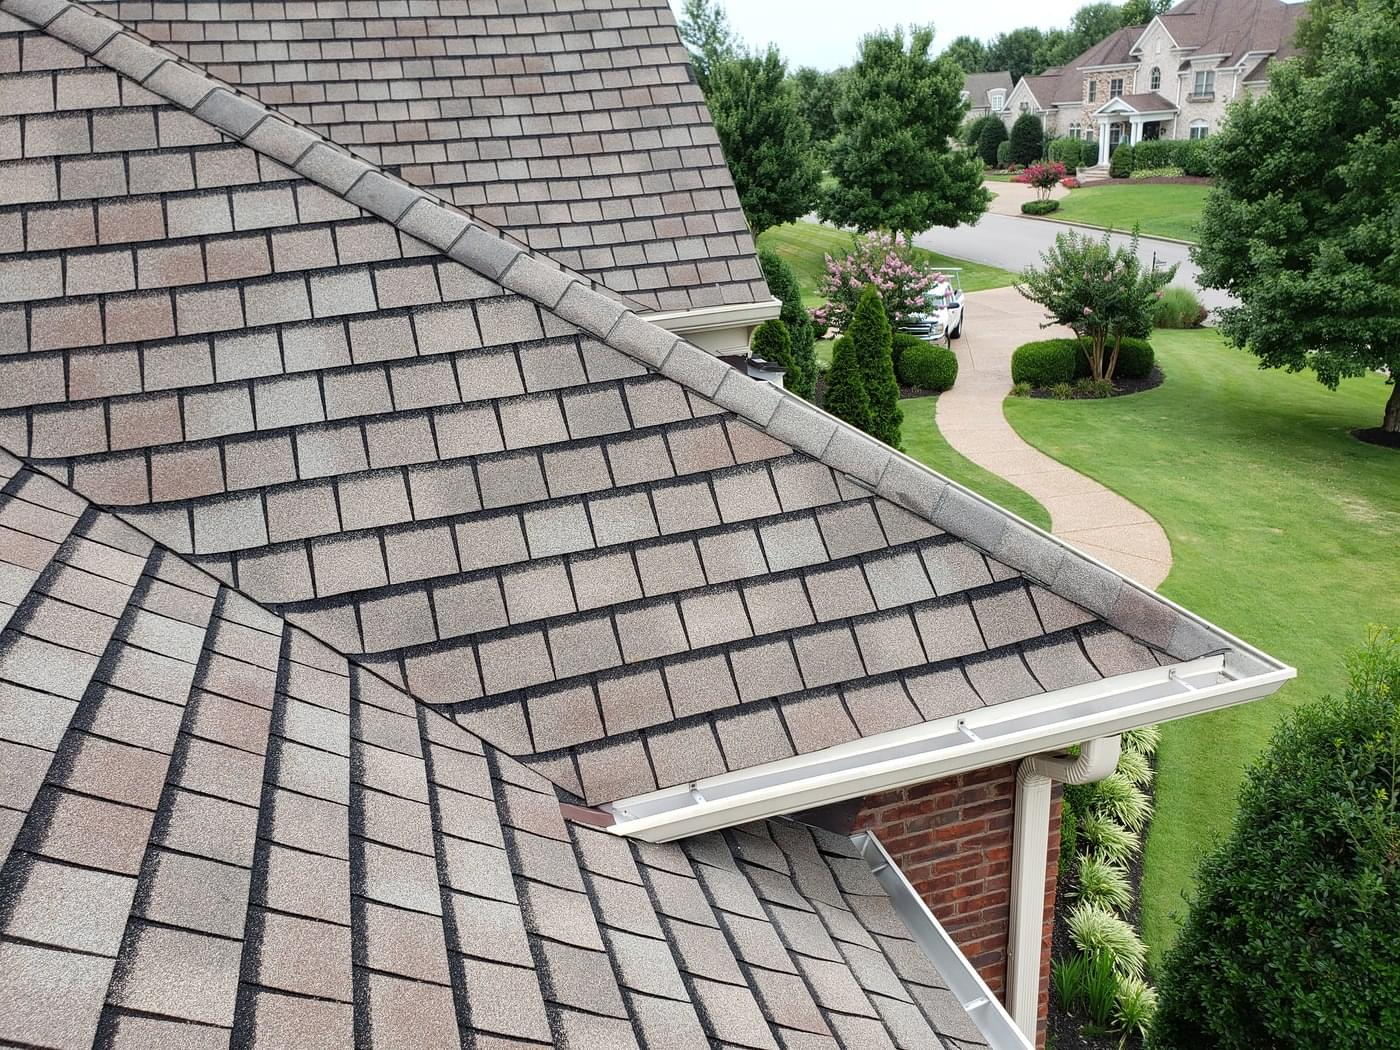 6 Best Roofing Contractors In Nashville Tennessee